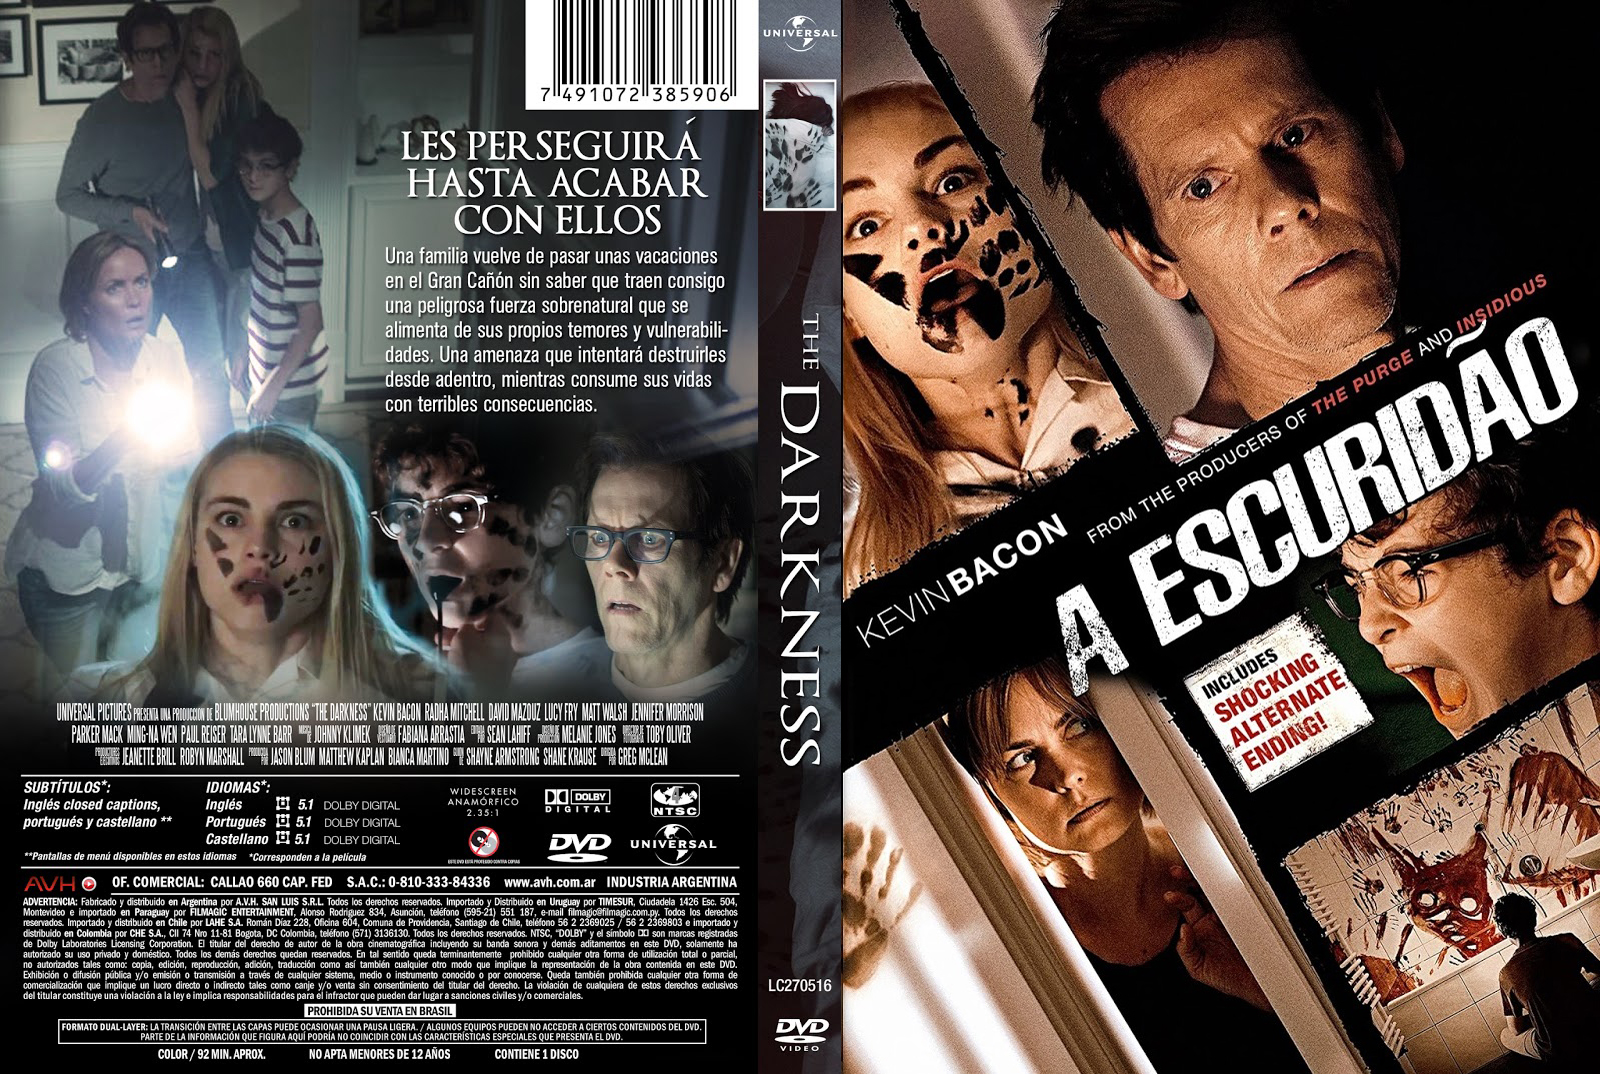 Download A Escuridão BDRip + DVD-R Download A Escuridão BDRip + DVD-R A 2BEscurid 25C3 25A3o 2B  2BXANDAO DOWNLOAD